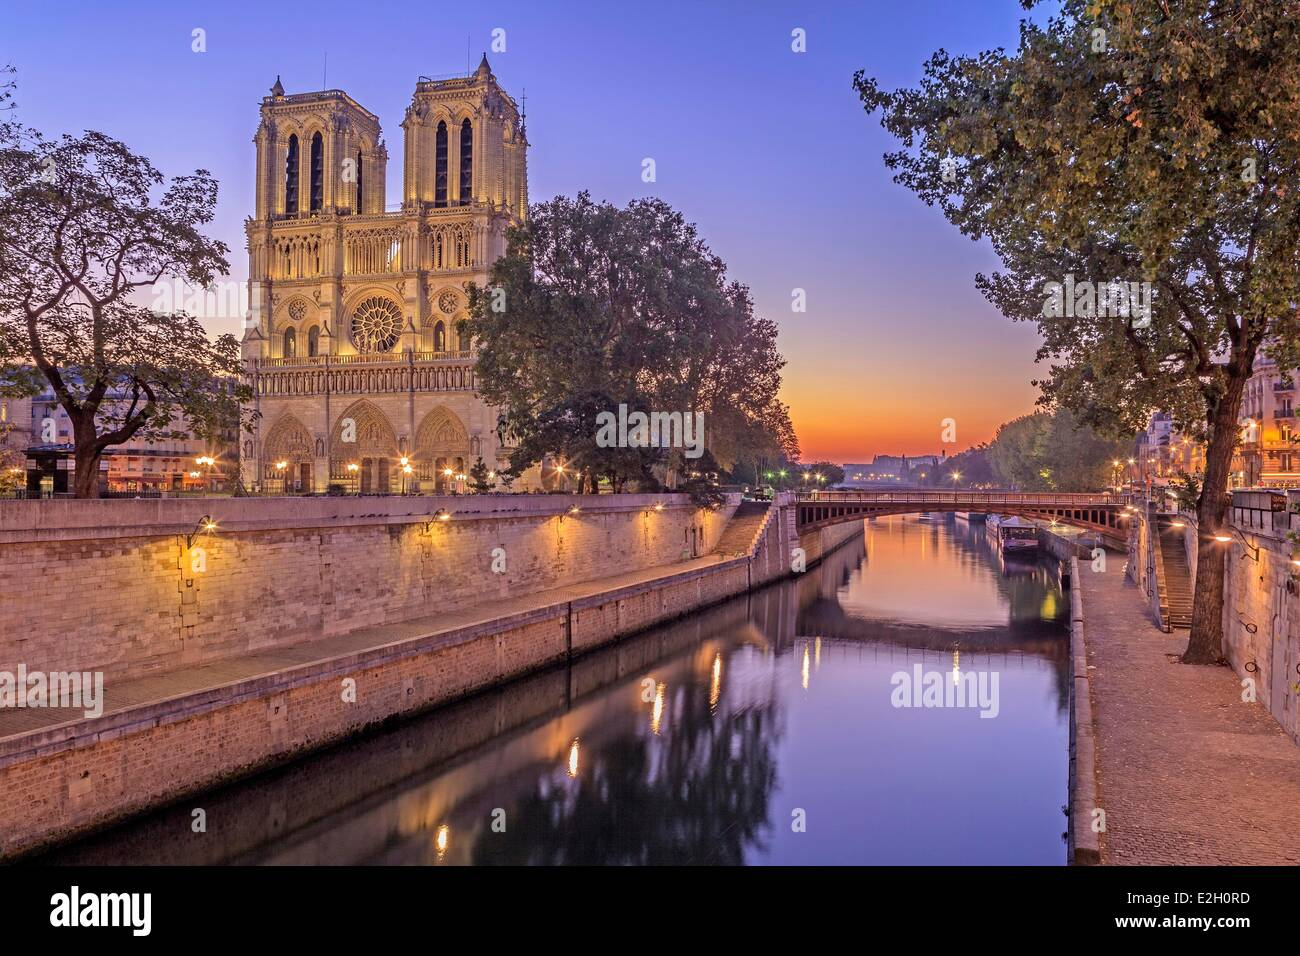 France Paris banks of Seine river listed as World Heritage by UNESCO Notre Dame cathedral on Ile de la Cite left - Stock Image